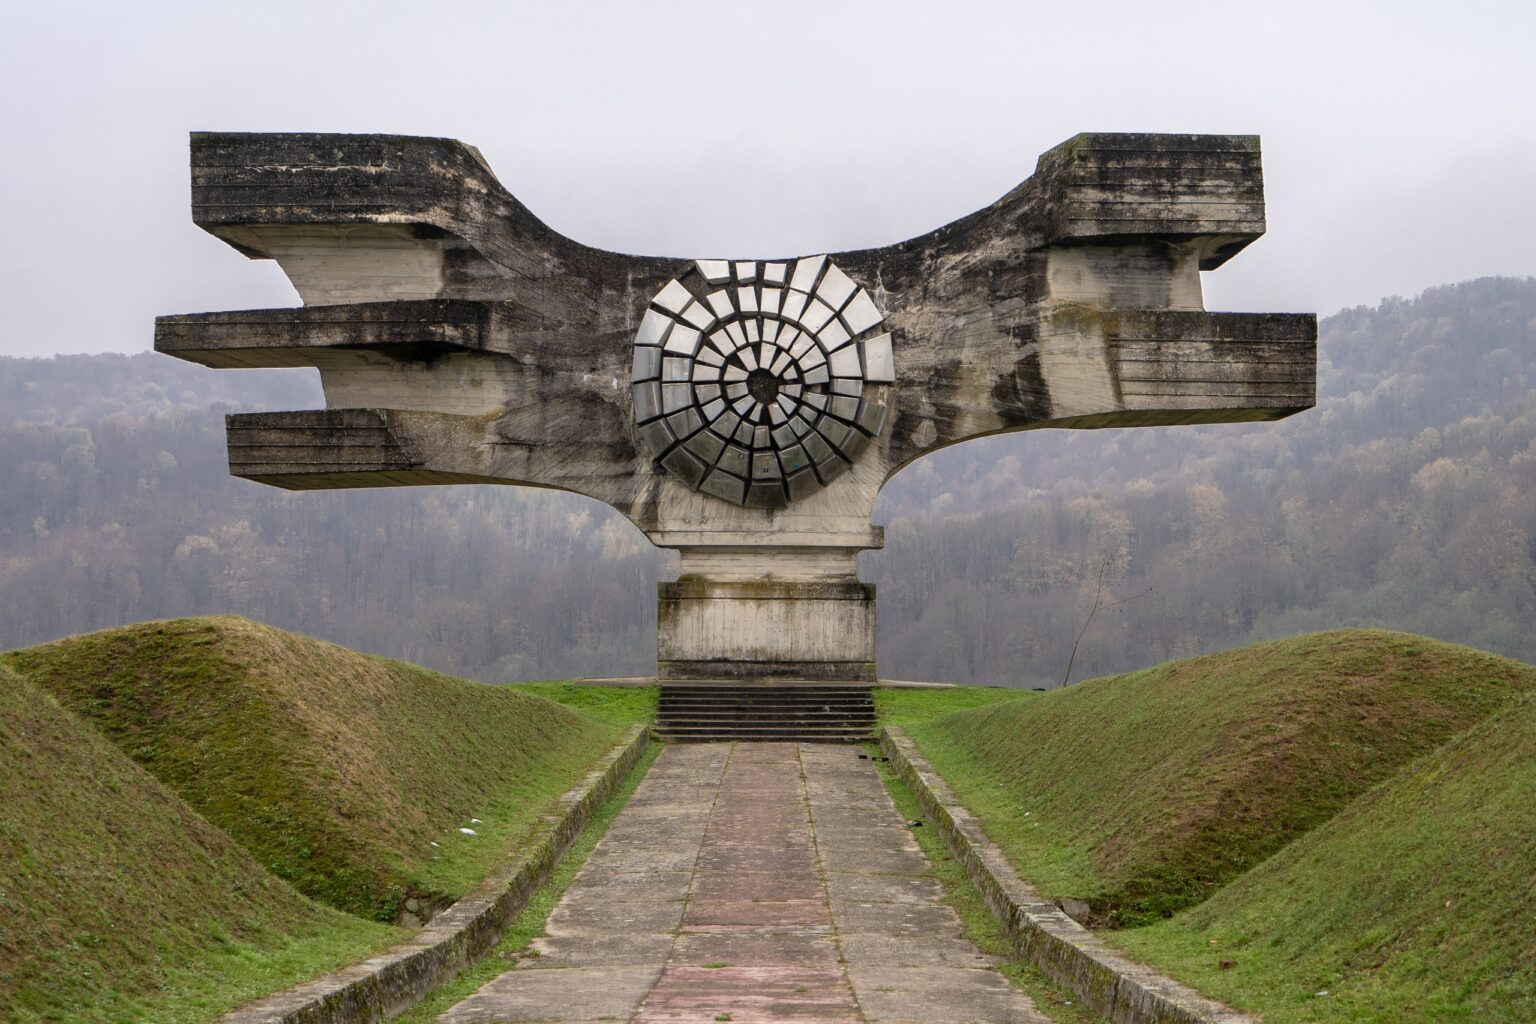 spomenik-horvatia-podgaric